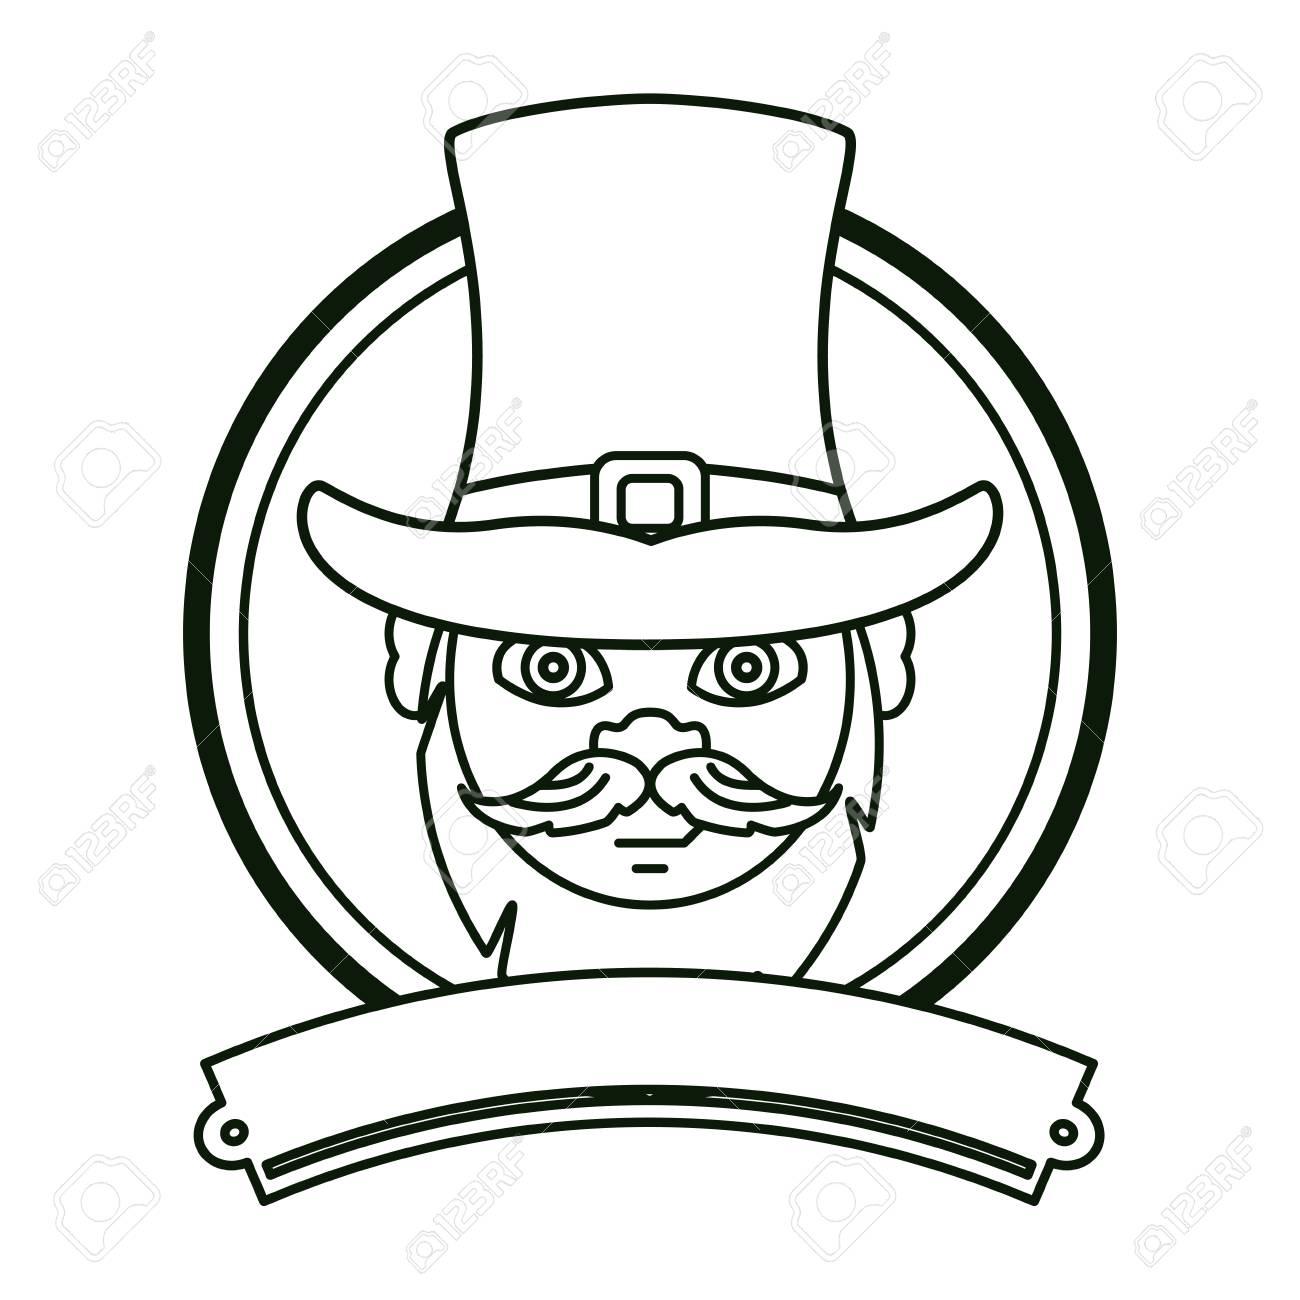 771b3f4a4cc Irish elf face with hat round emblem ribbon banner vector illustration  graphic design Stock Vector -